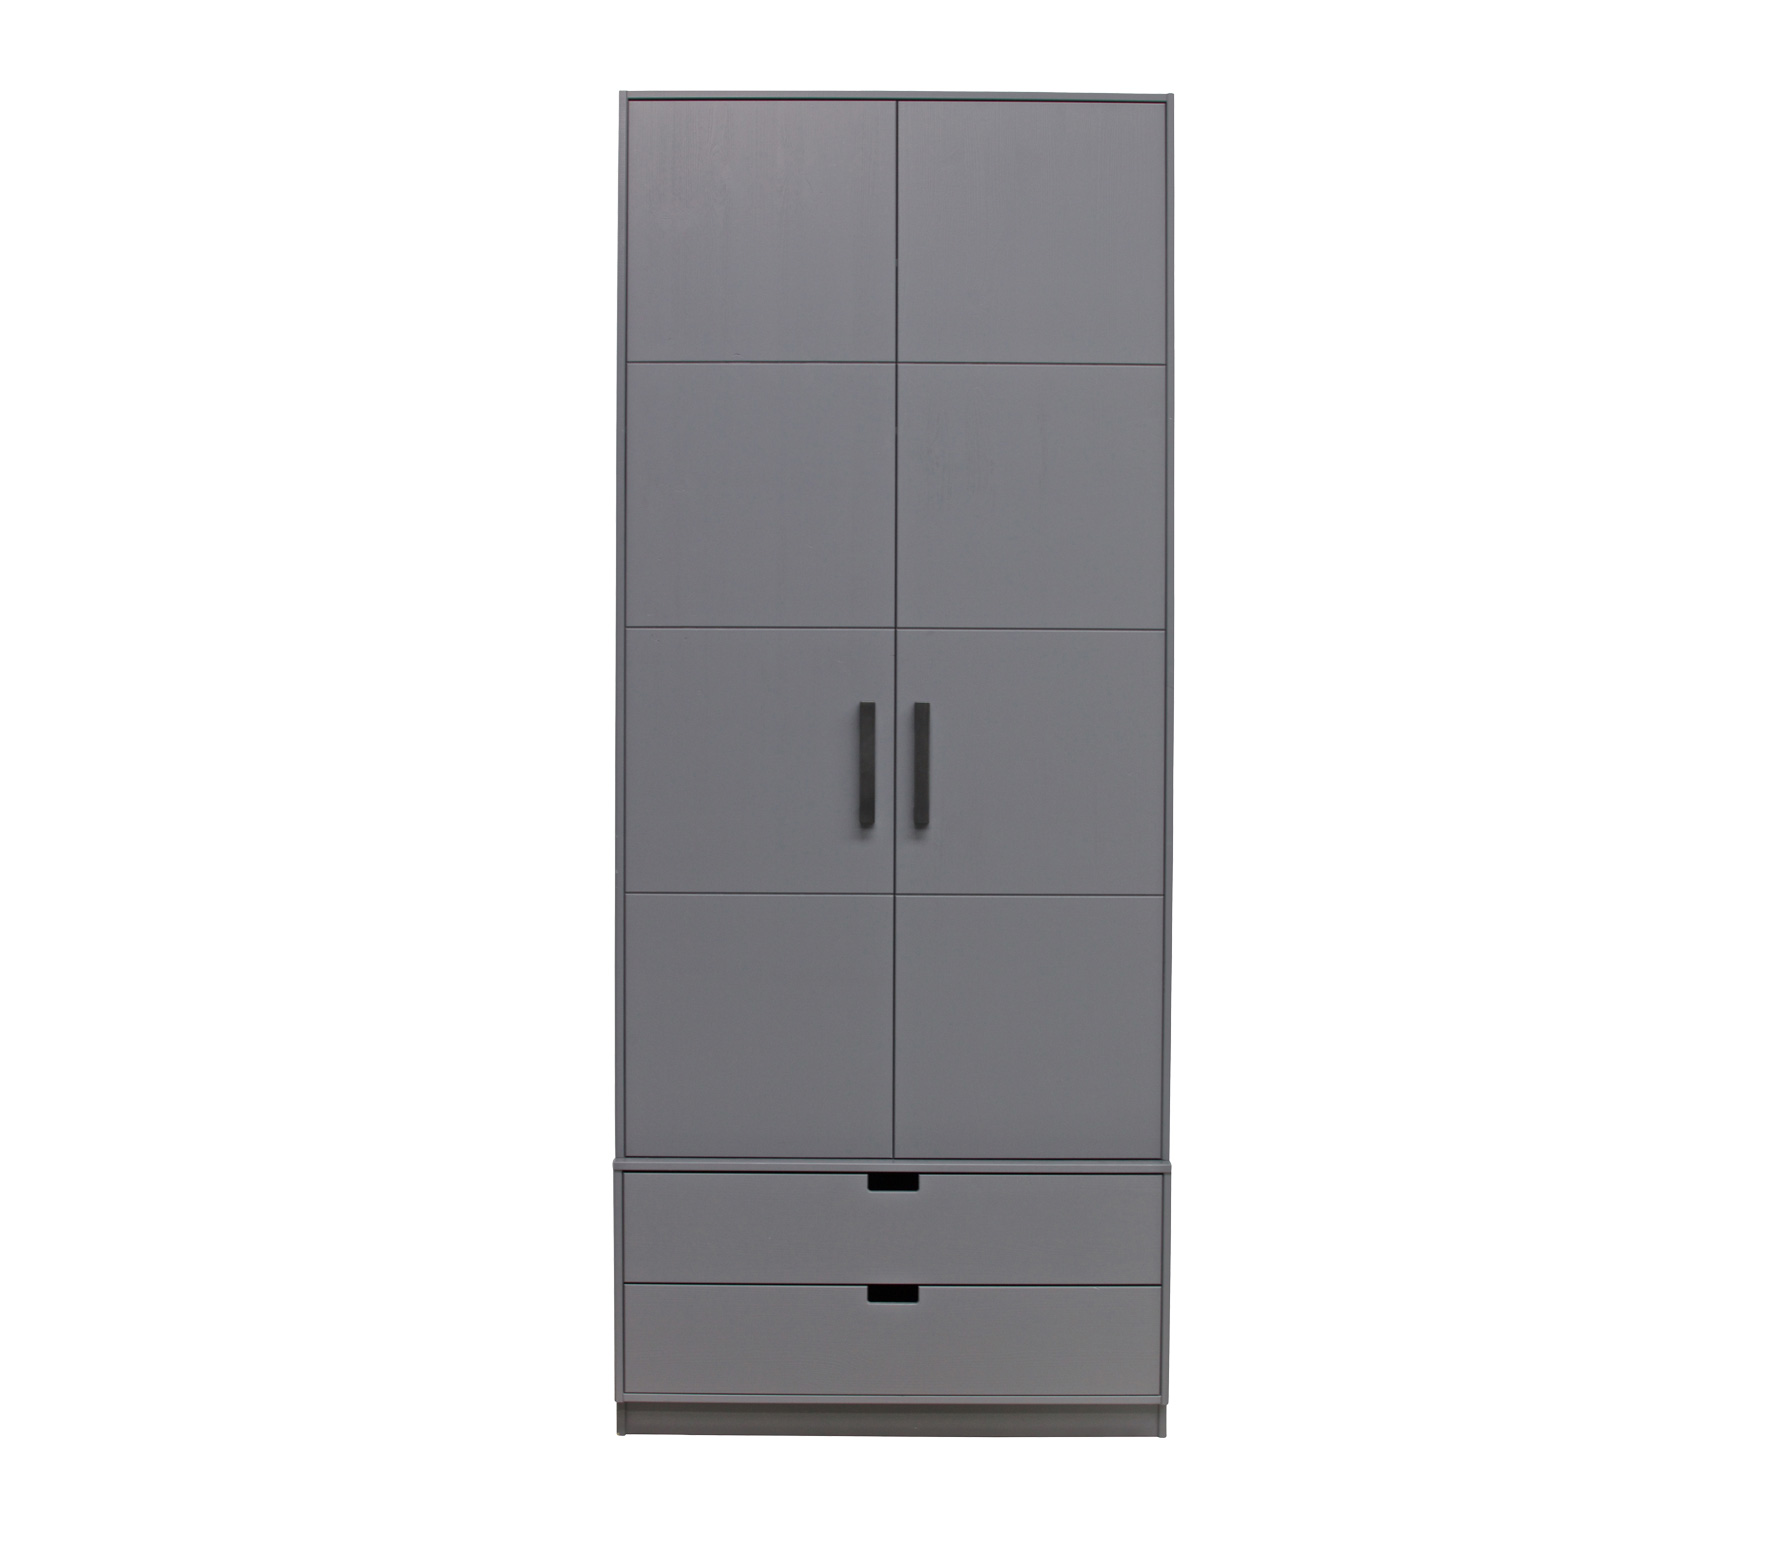 Basiclabel SKIK kast variant 21 leem 231x95x62 cm massief grenen